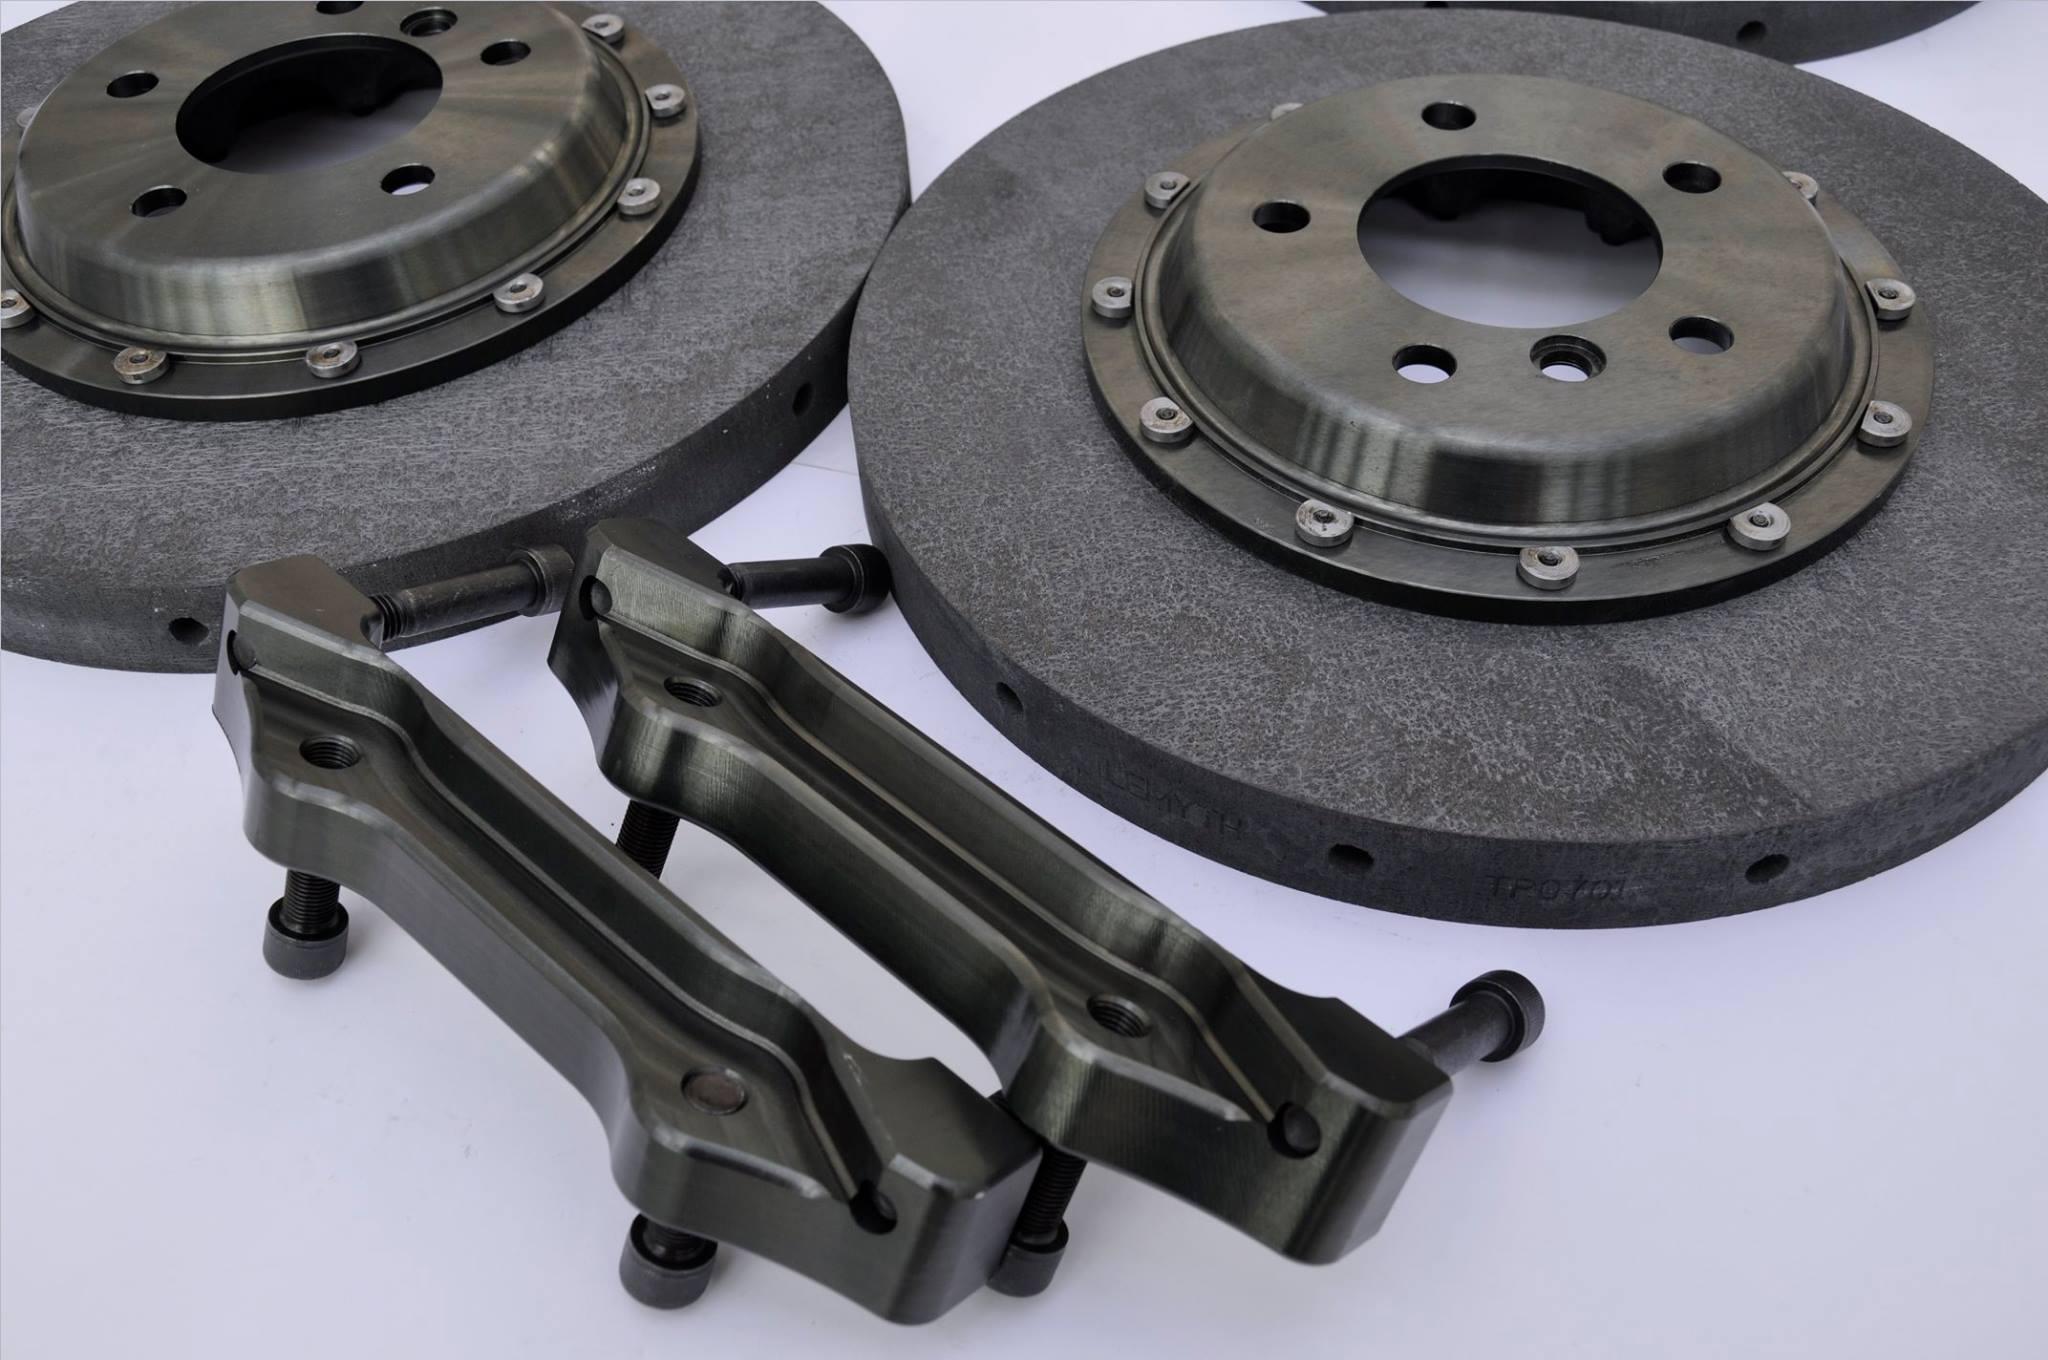 BMW 335i carbon-ceramic brake kit